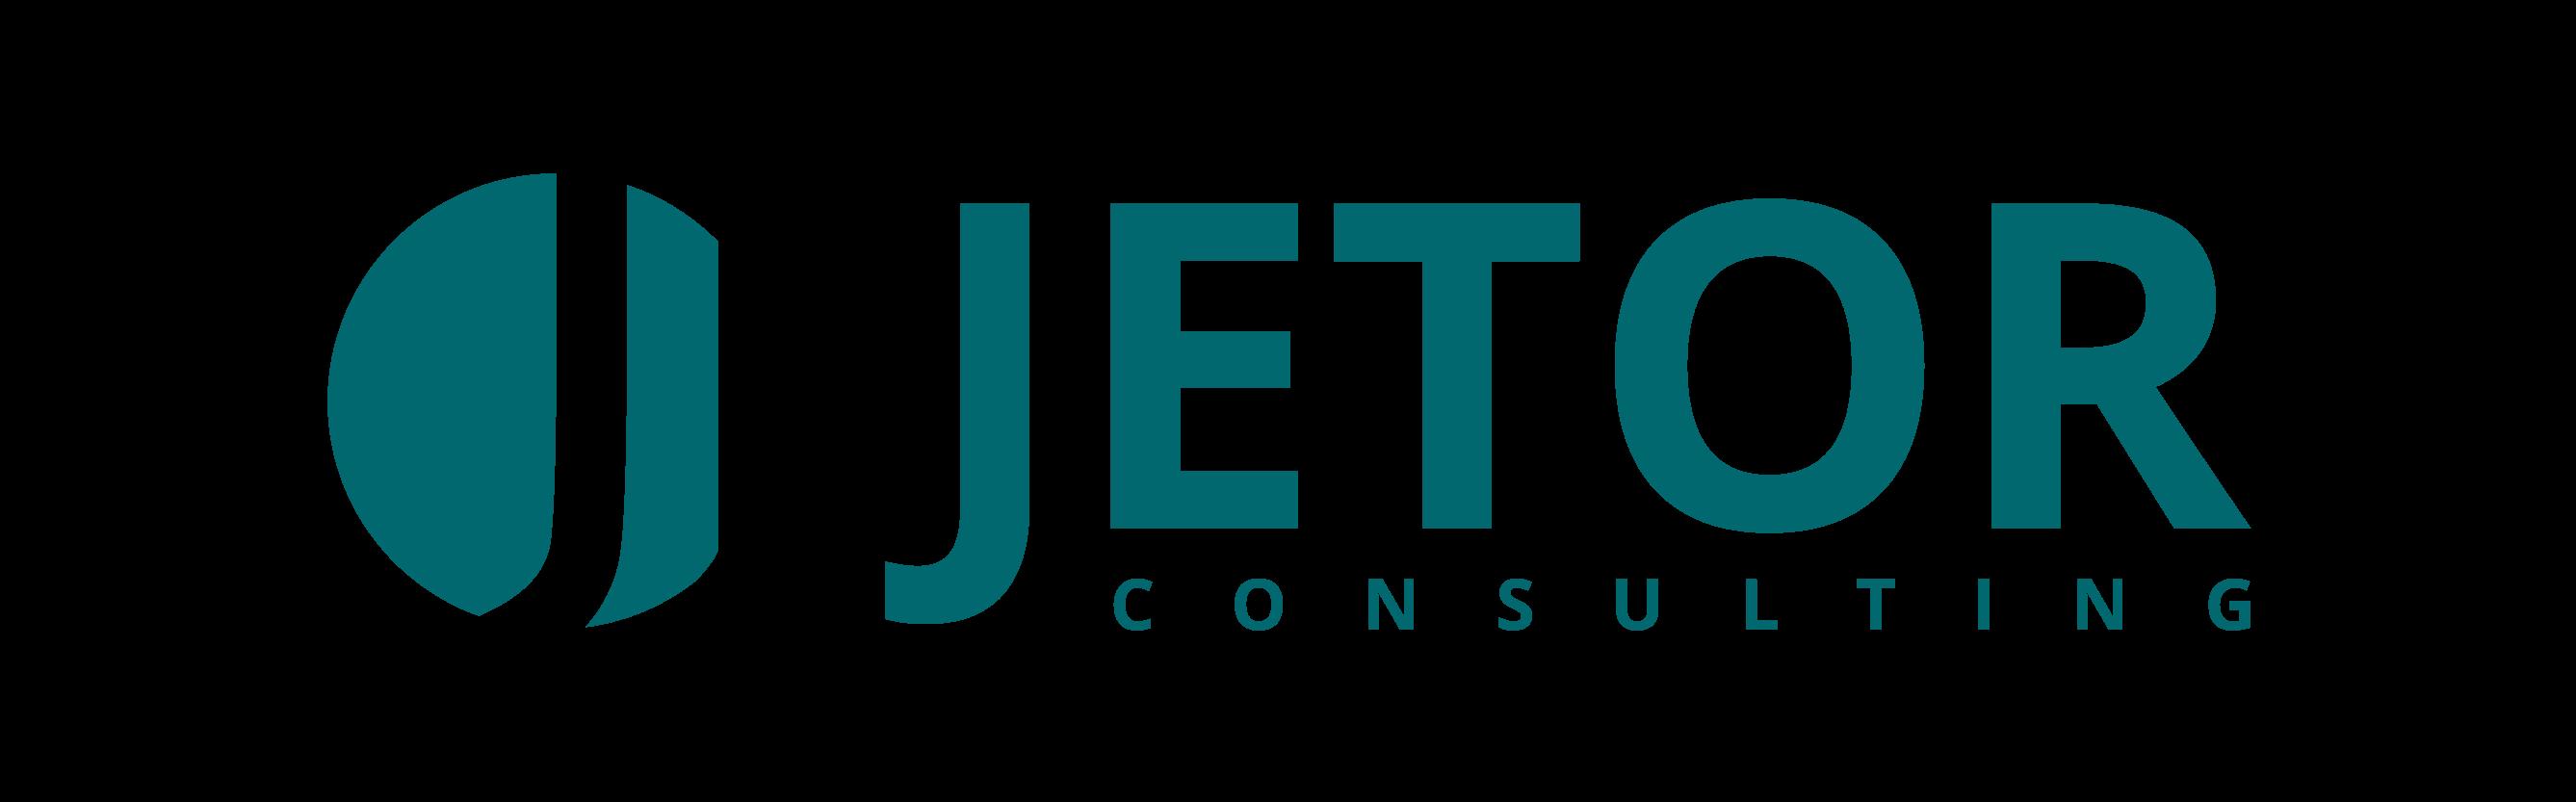 JETOR Consulting